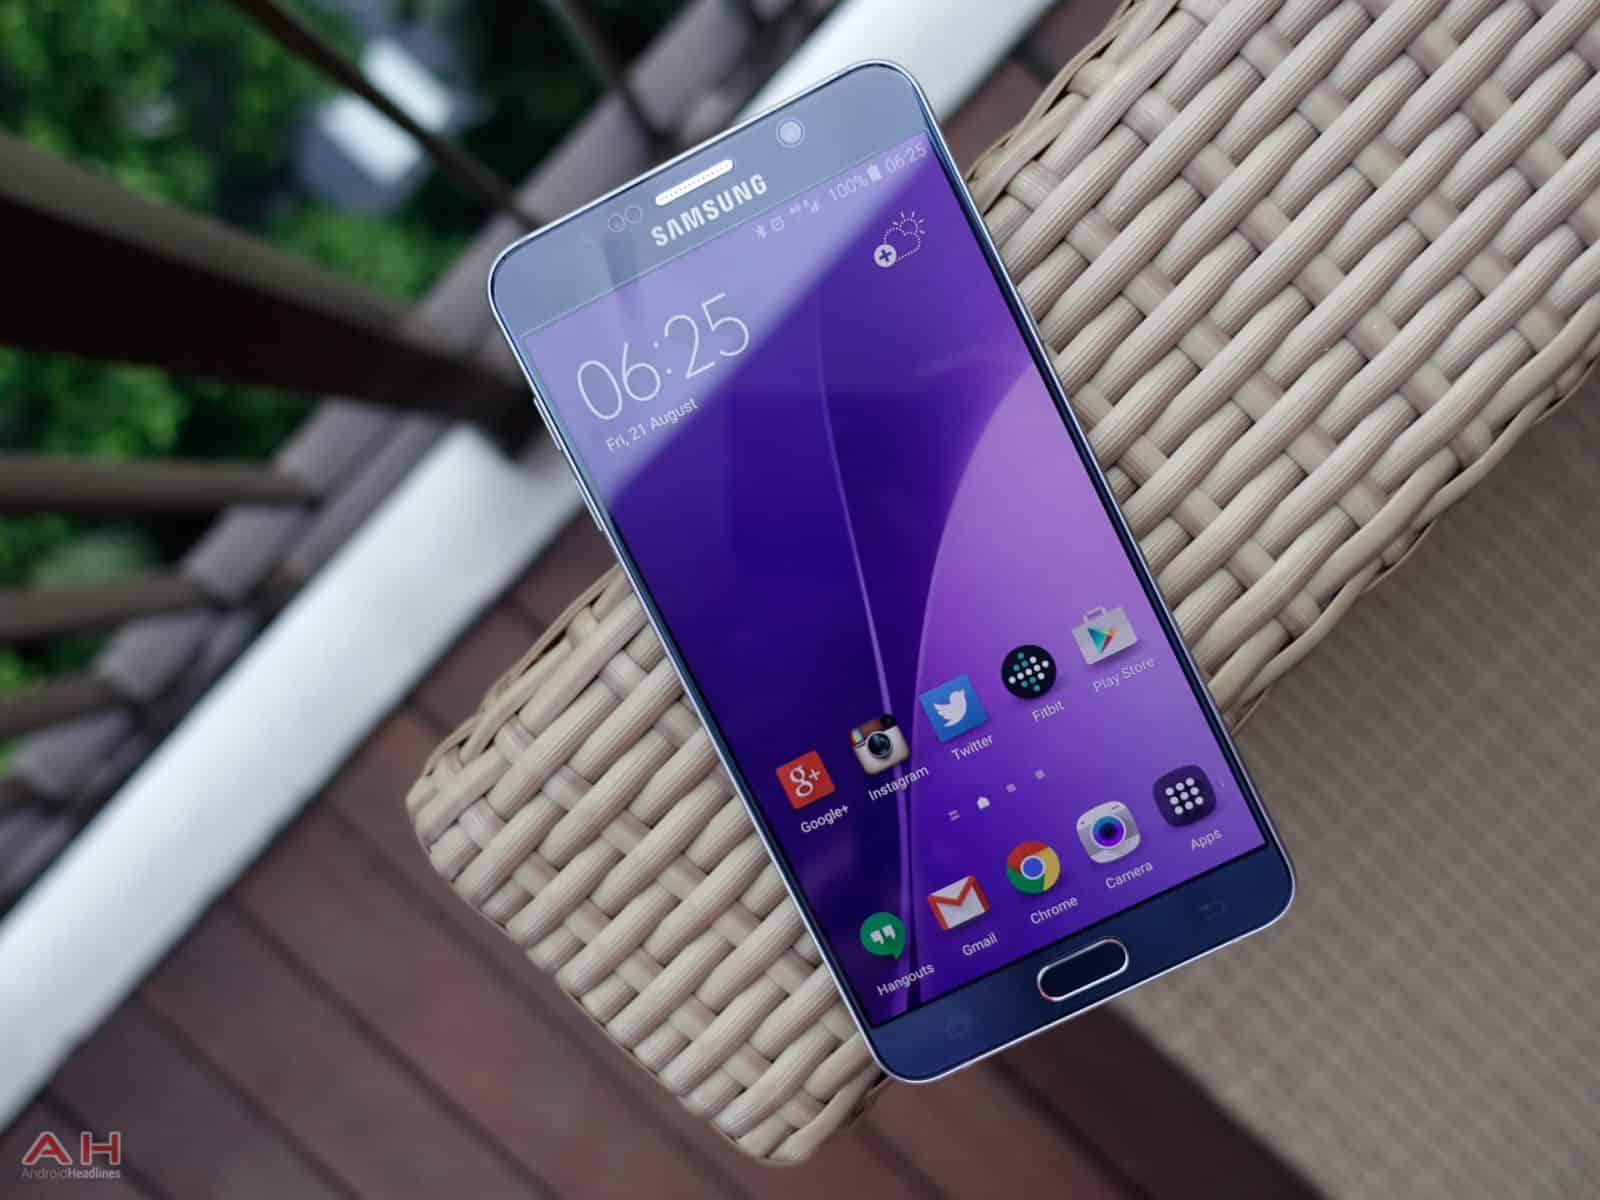 Samsung-Galaxy-Note-5-2-AH-4